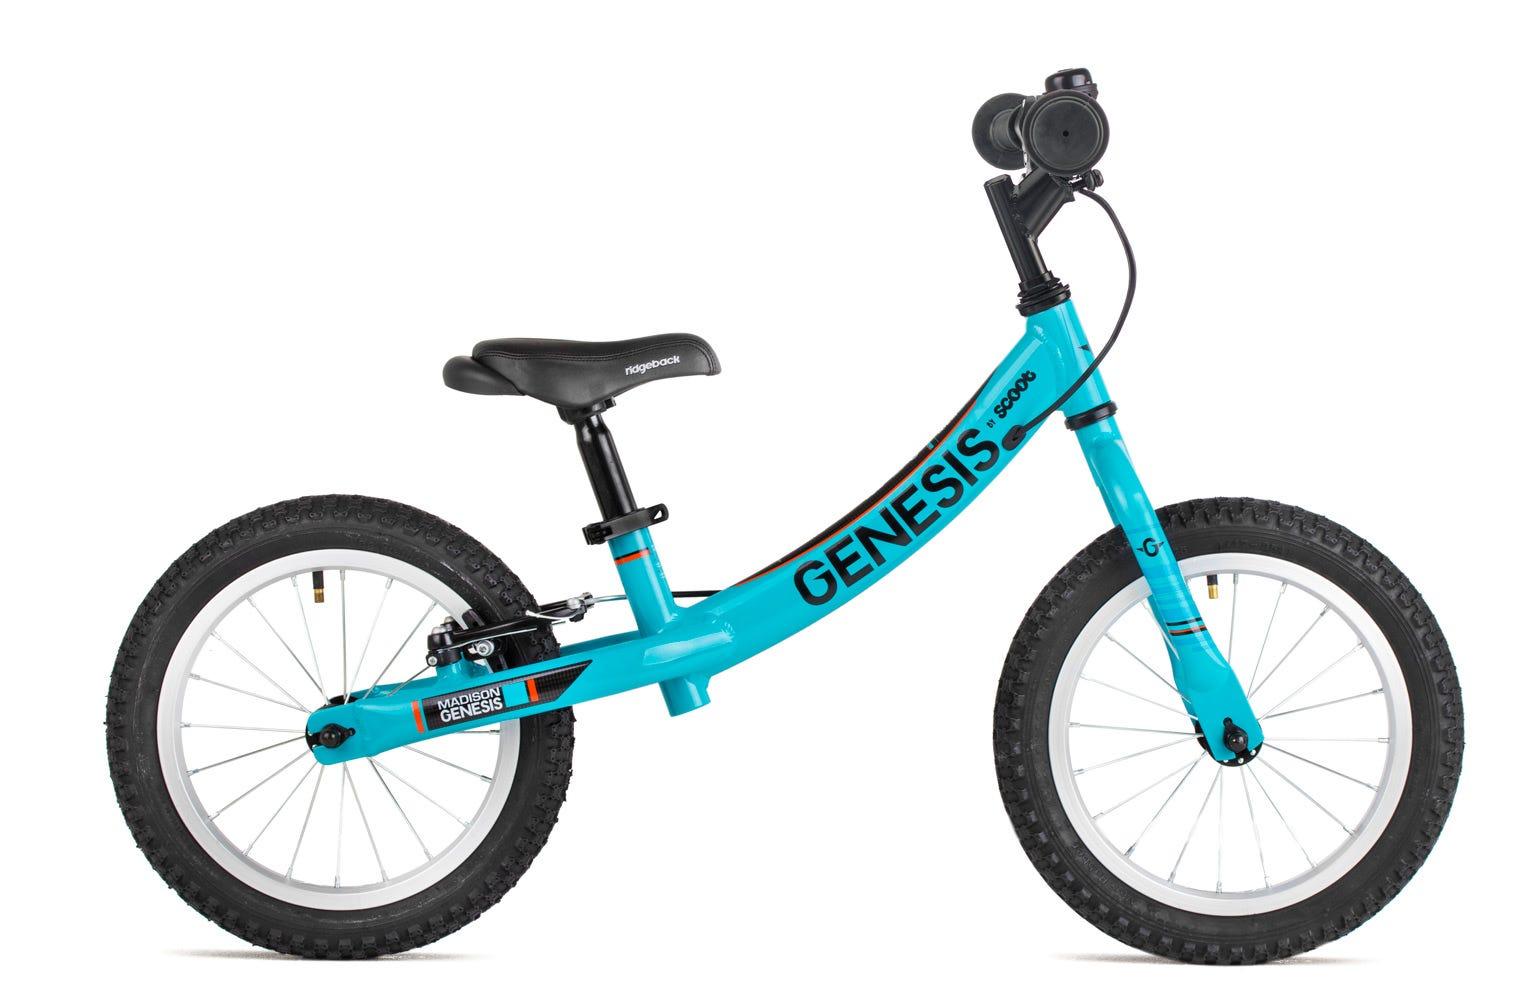 Genesis 2018 MGT Scoot XL beginner bike